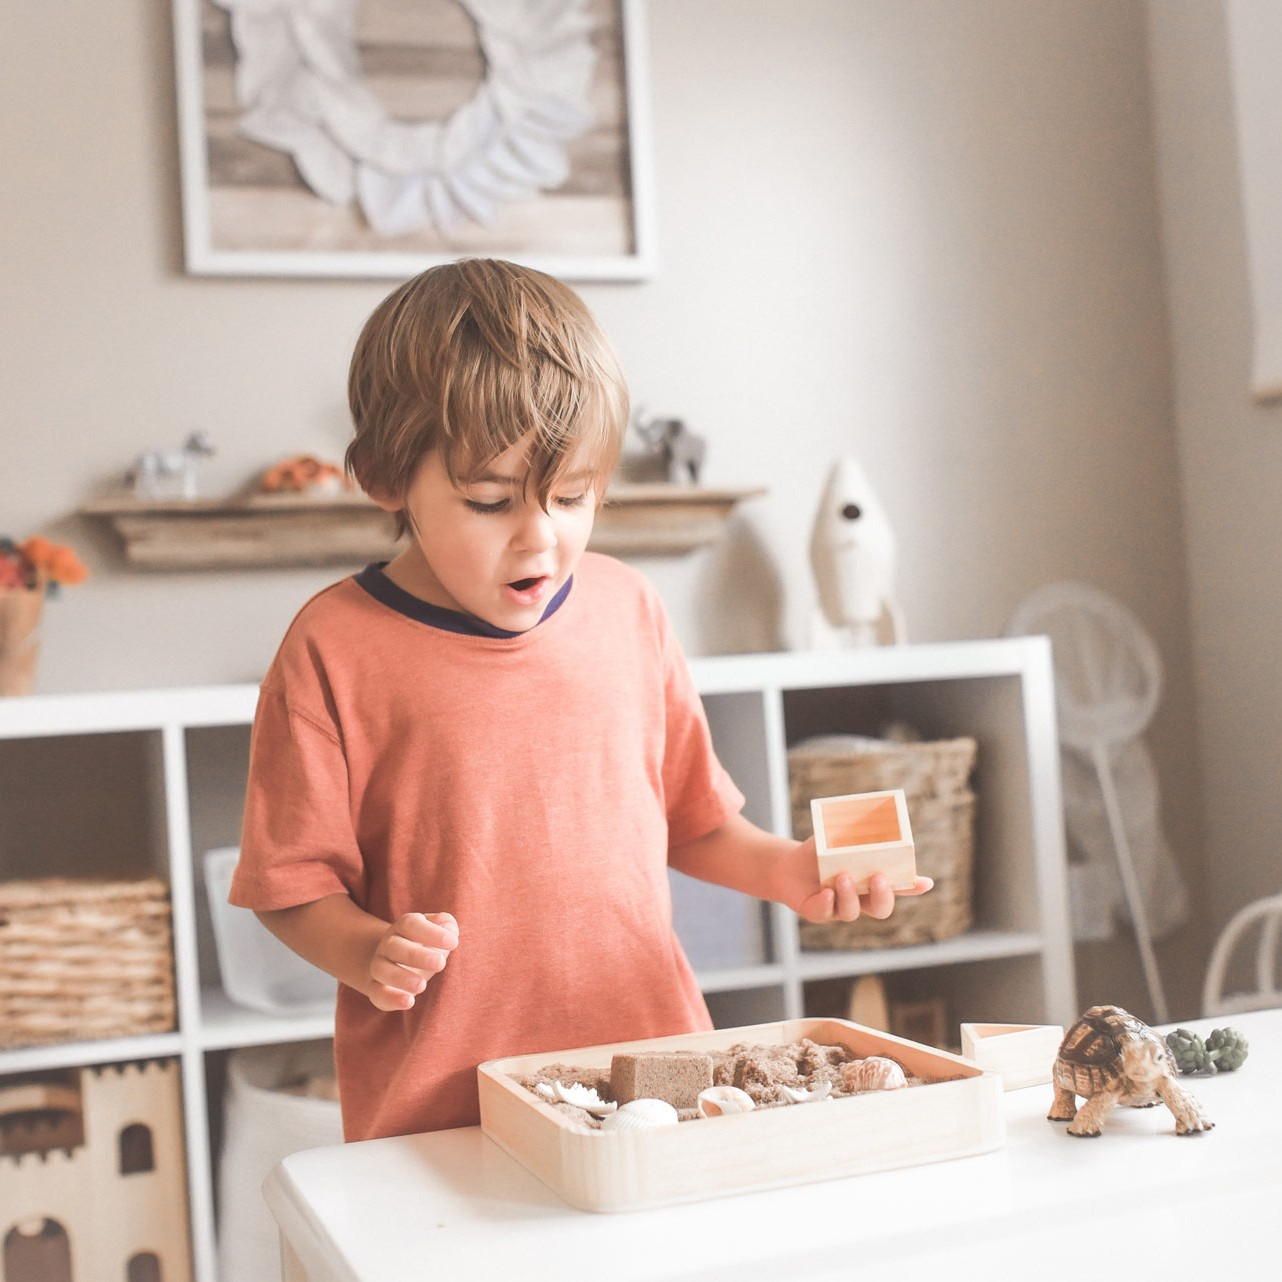 Neurology in children. The Role of Child Neuropsychiatry (PART II)